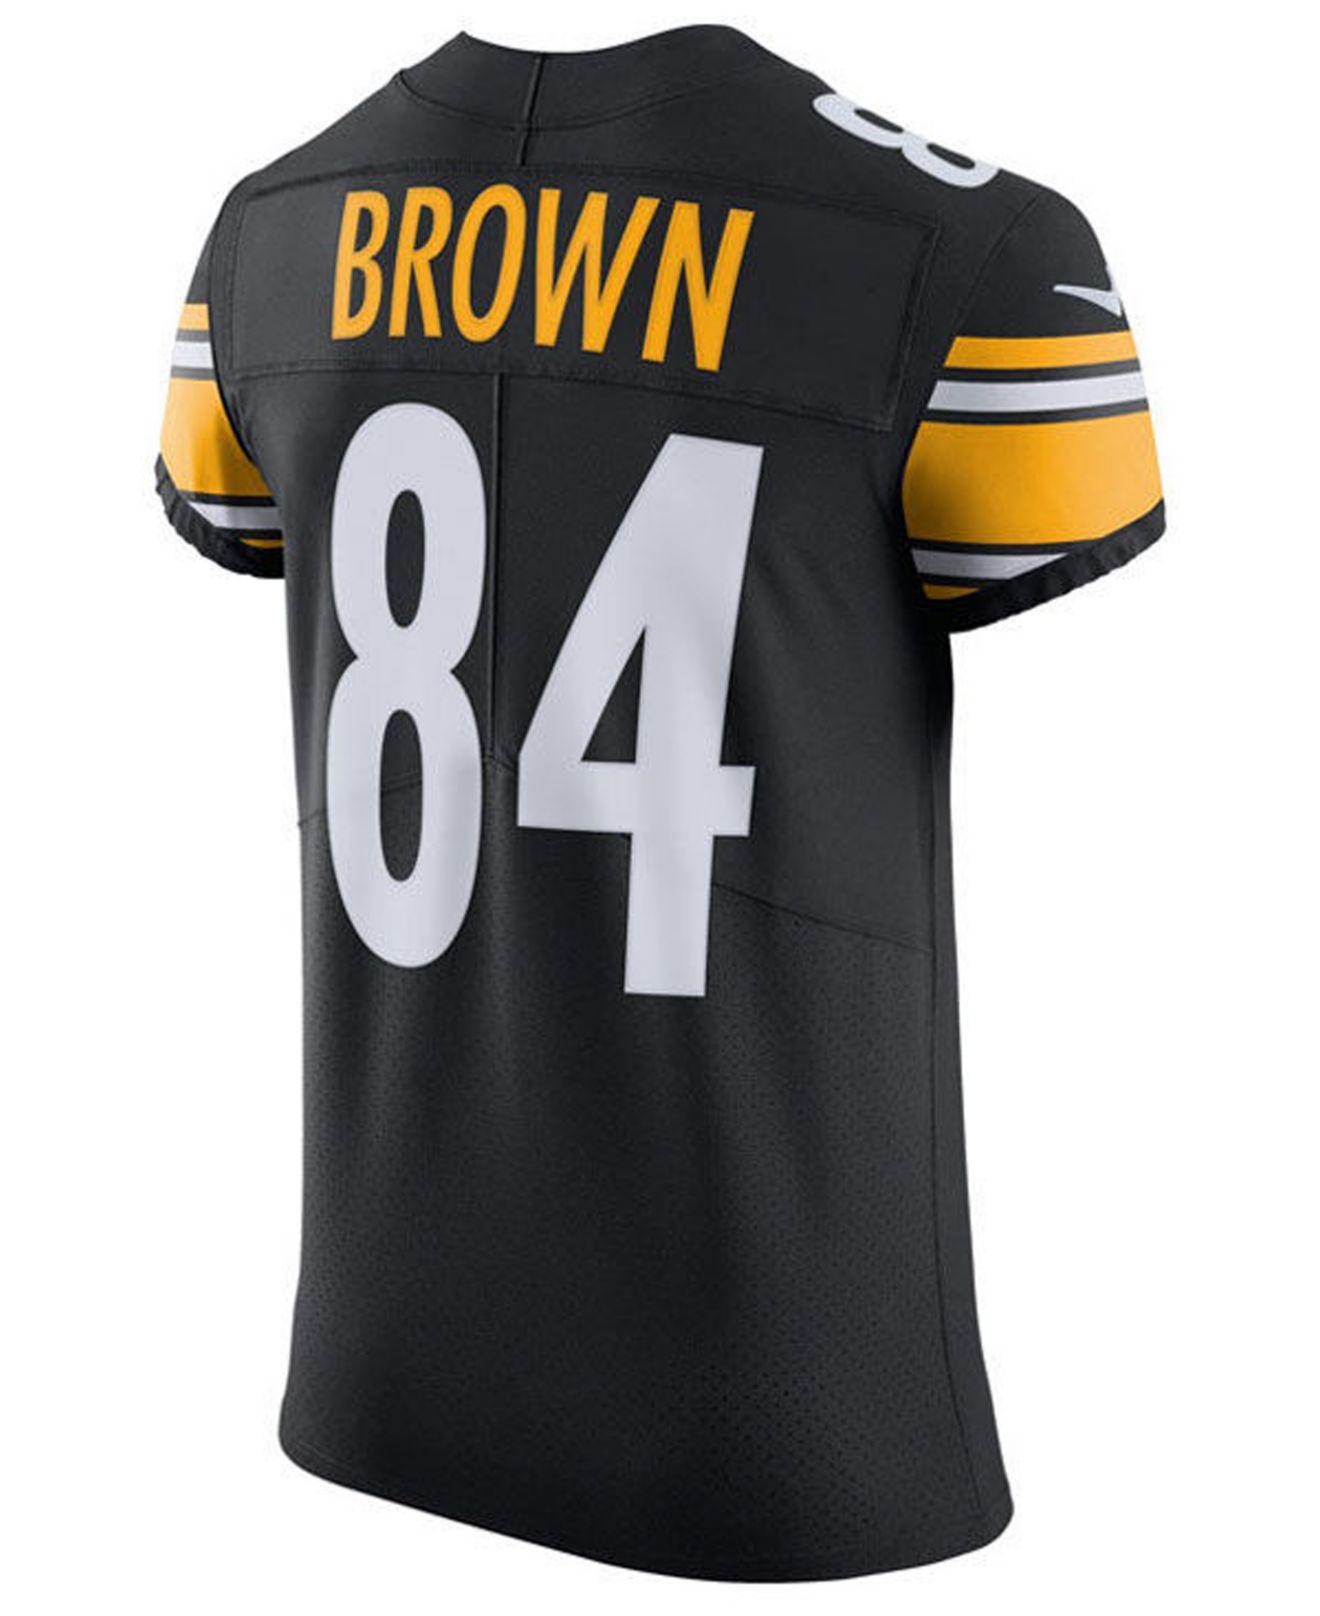 676f1053984 Lyst - Nike Antonio Brown Pittsburgh Steelers Vapor Untouchable Elite Jersey  in Black for Men